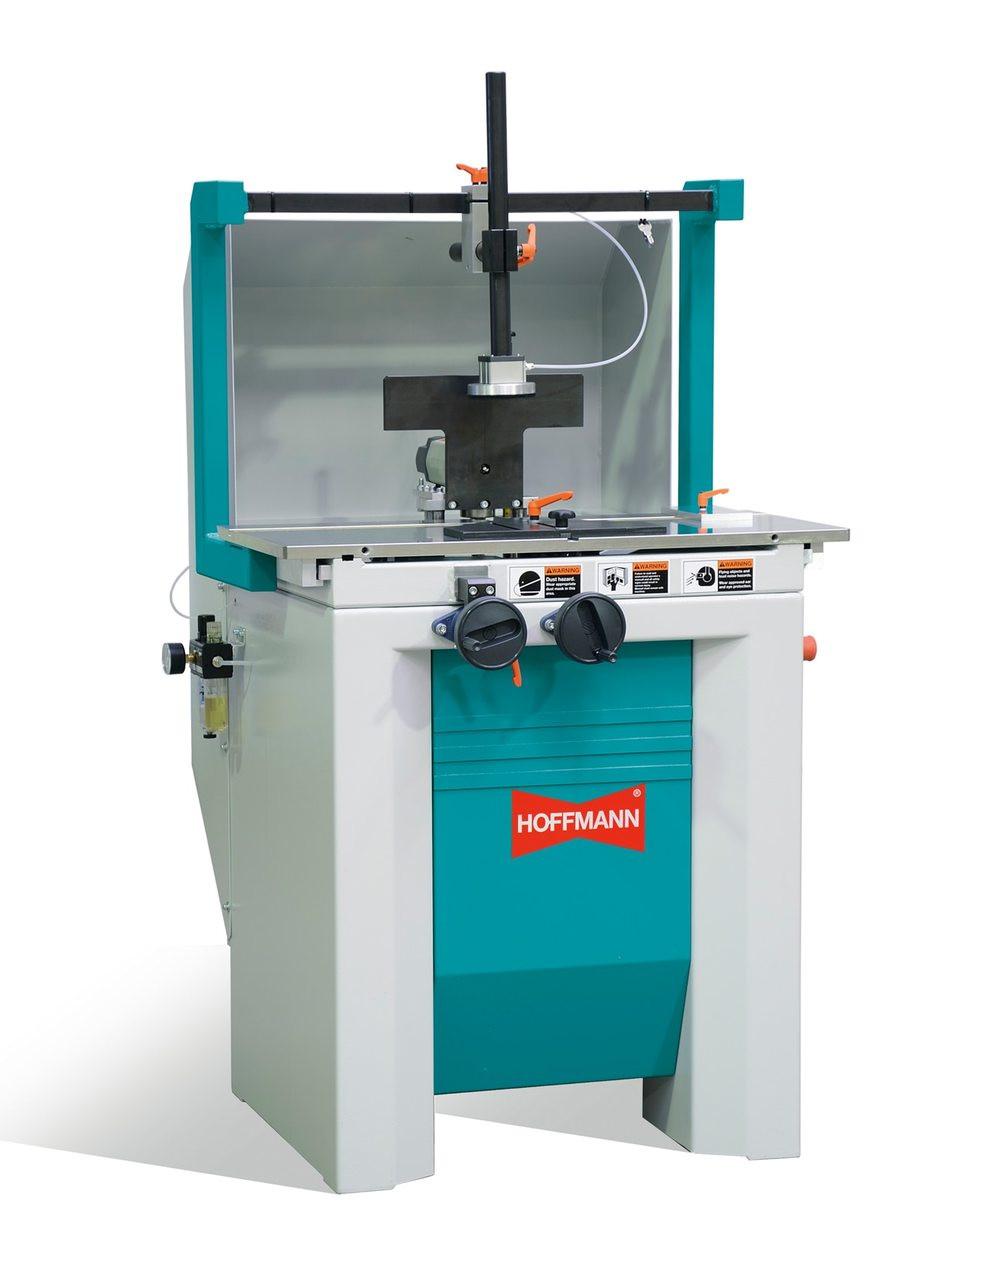 Hoffmann PU2-TL Pneumatic Dovetail Routing Machine